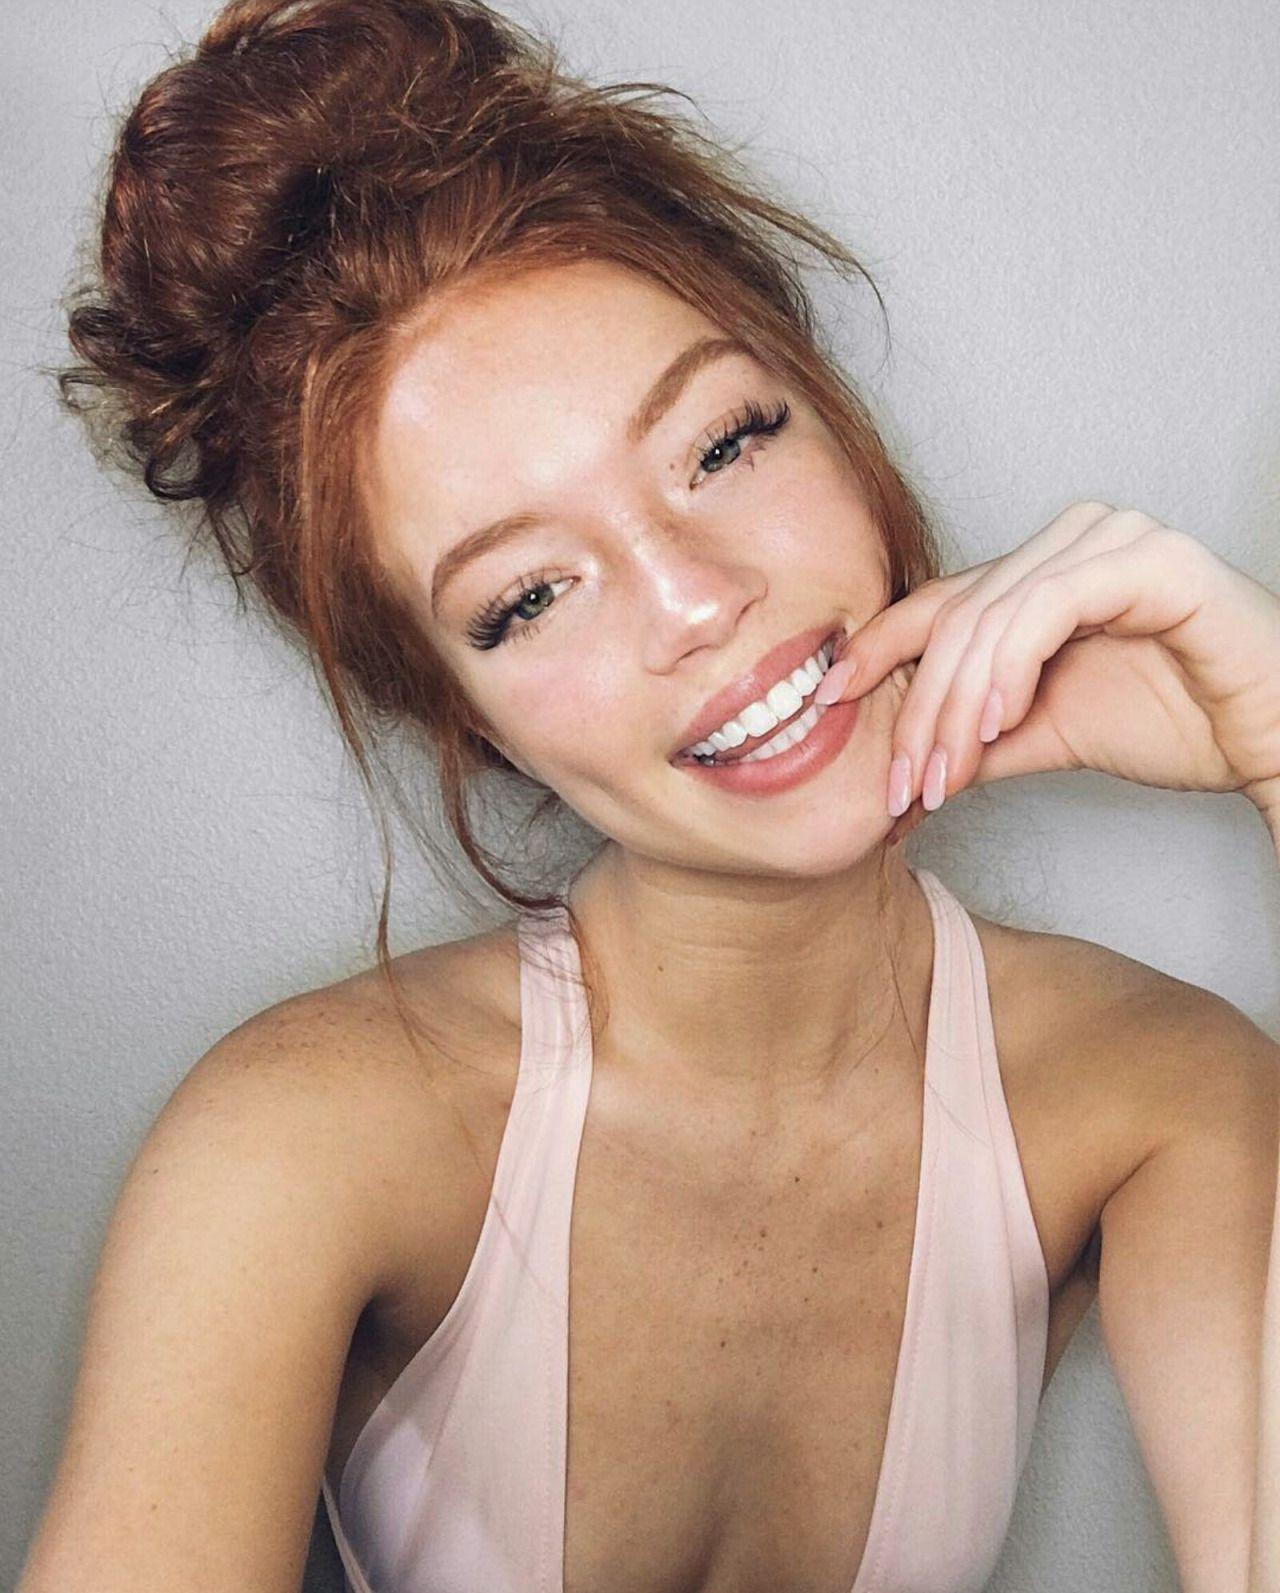 Elma redhead pics